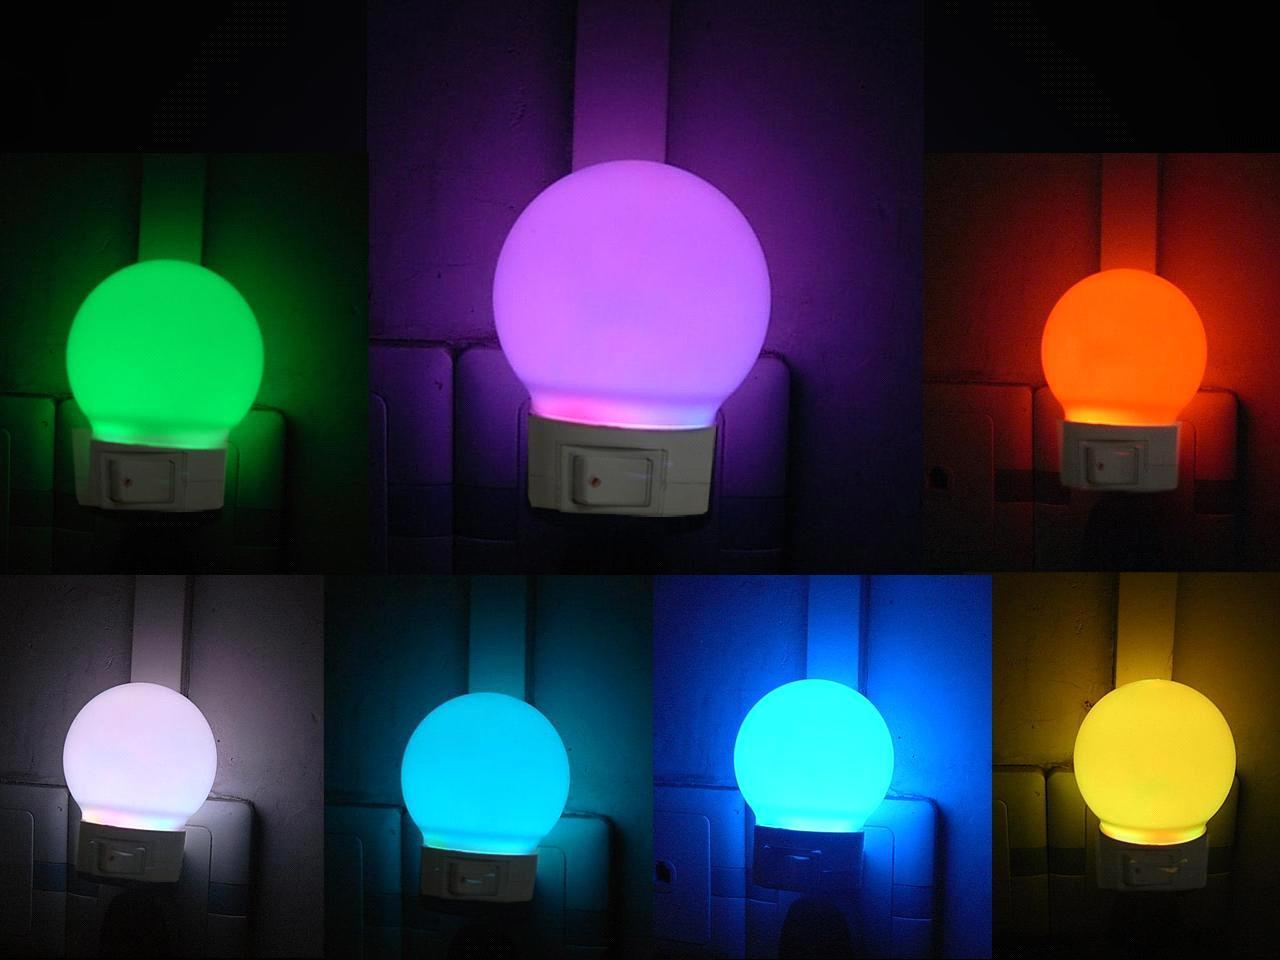 color controllable led bulb sd v60 sd v60 china led light led. Black Bedroom Furniture Sets. Home Design Ideas